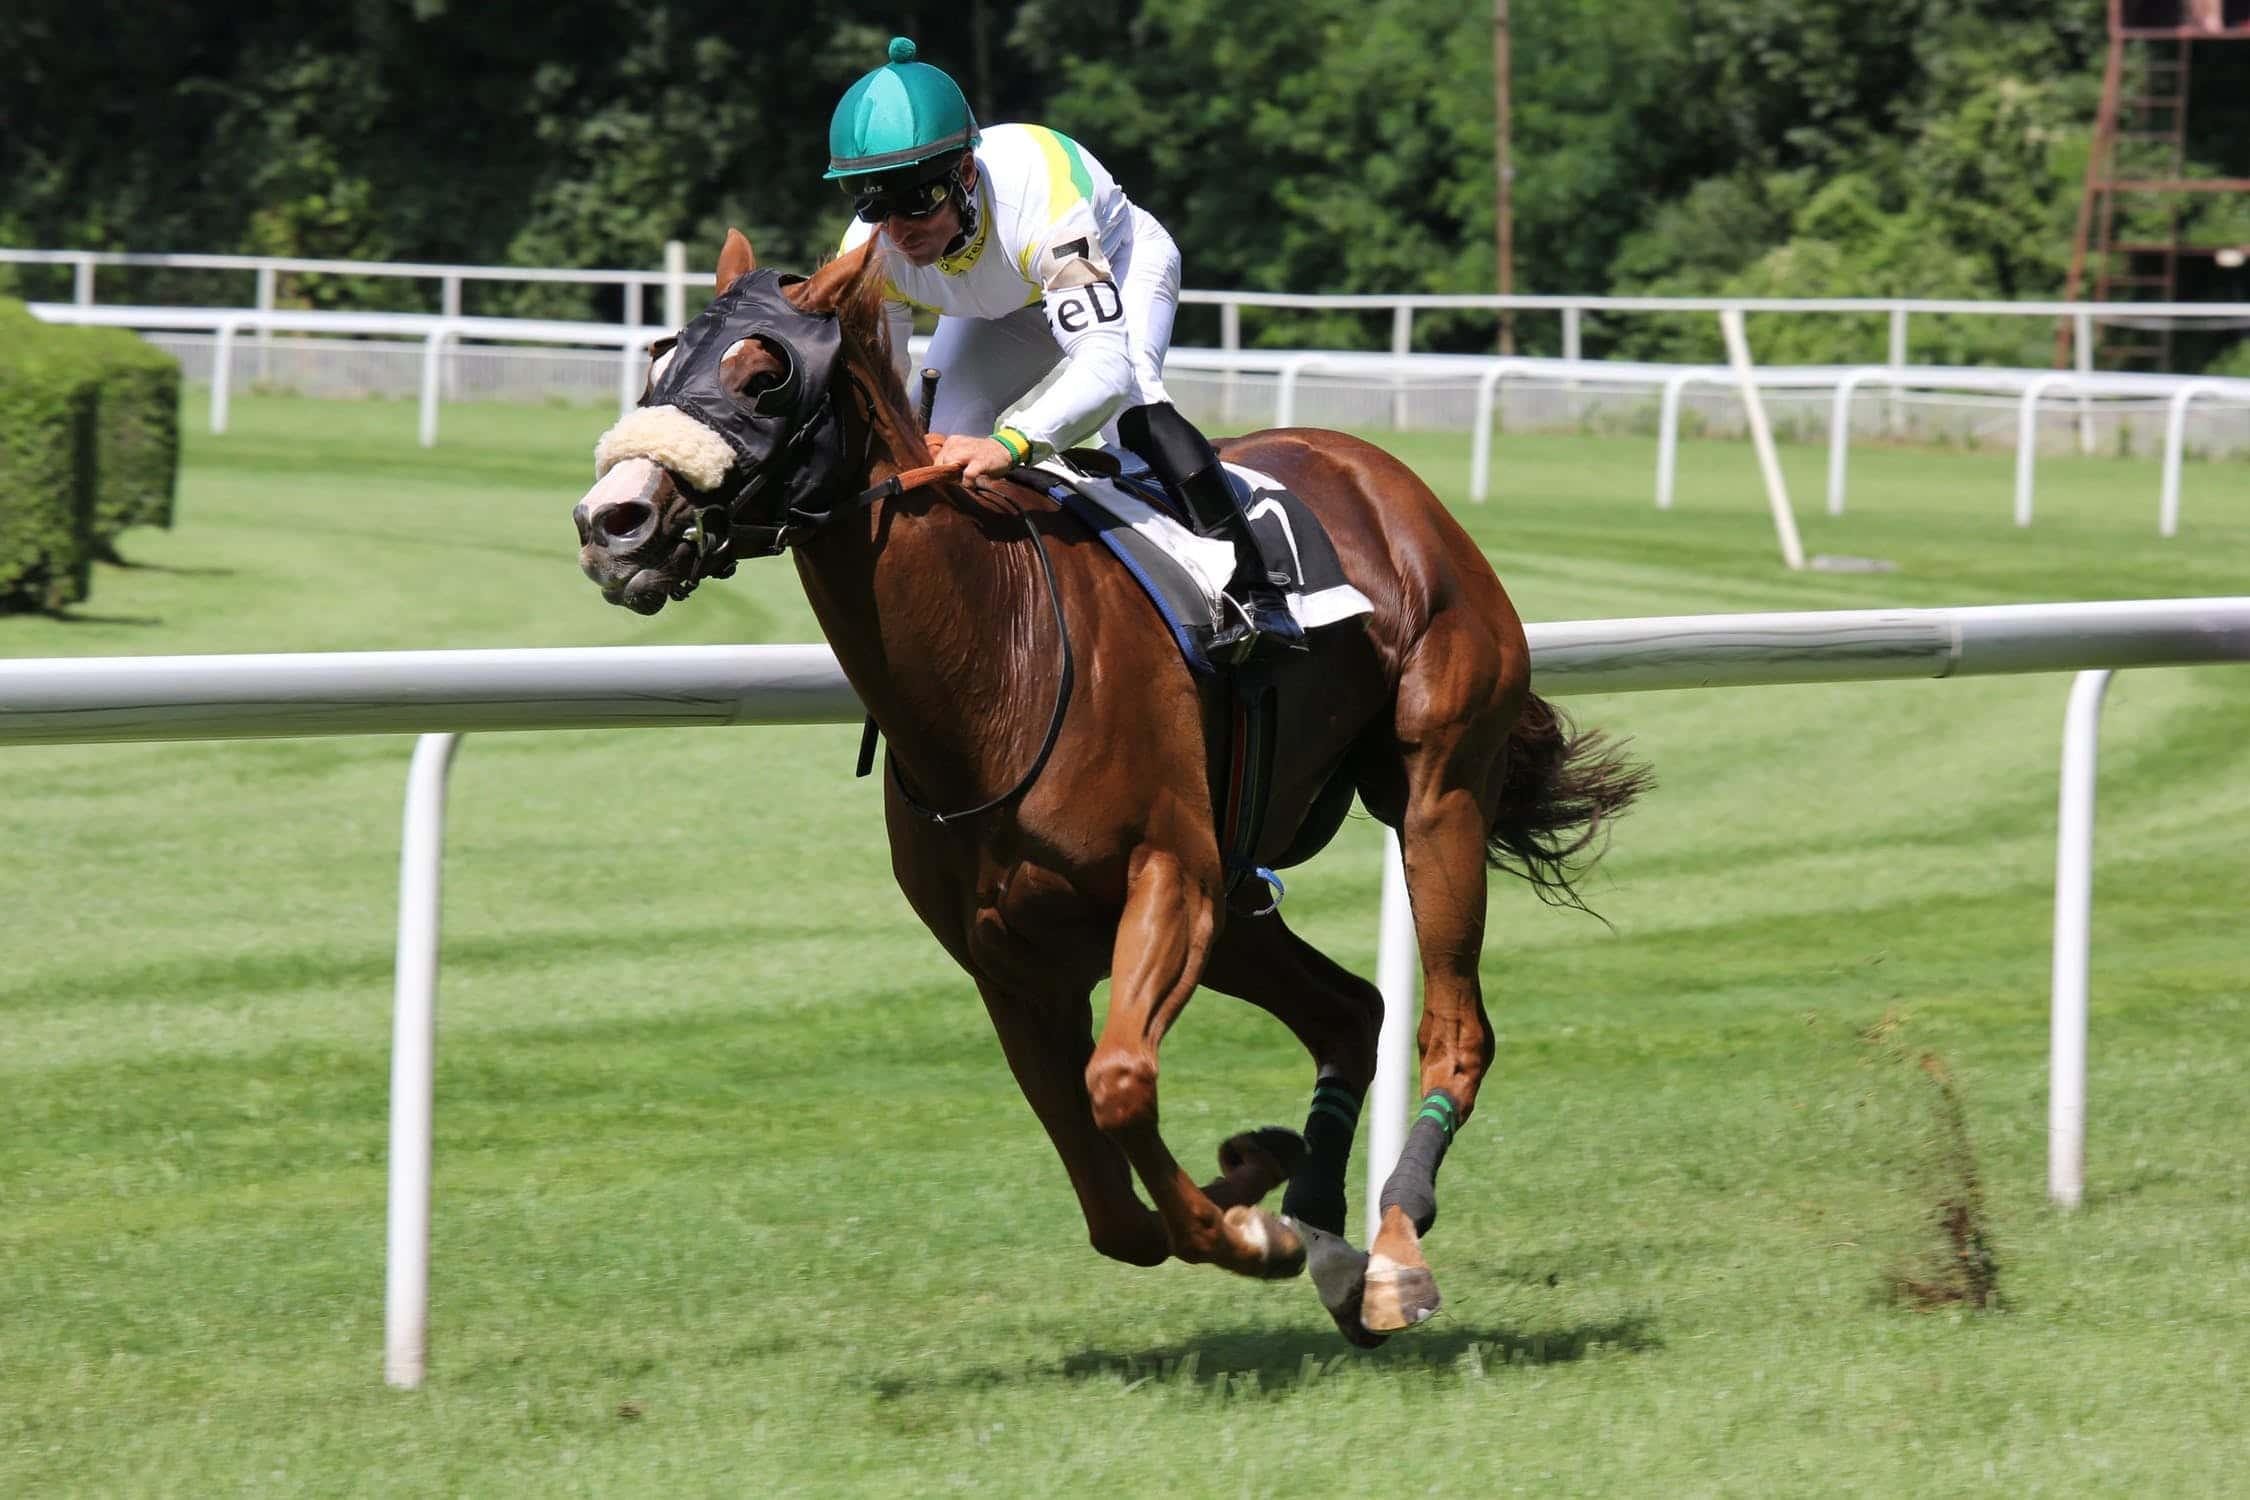 Rider racing a horse